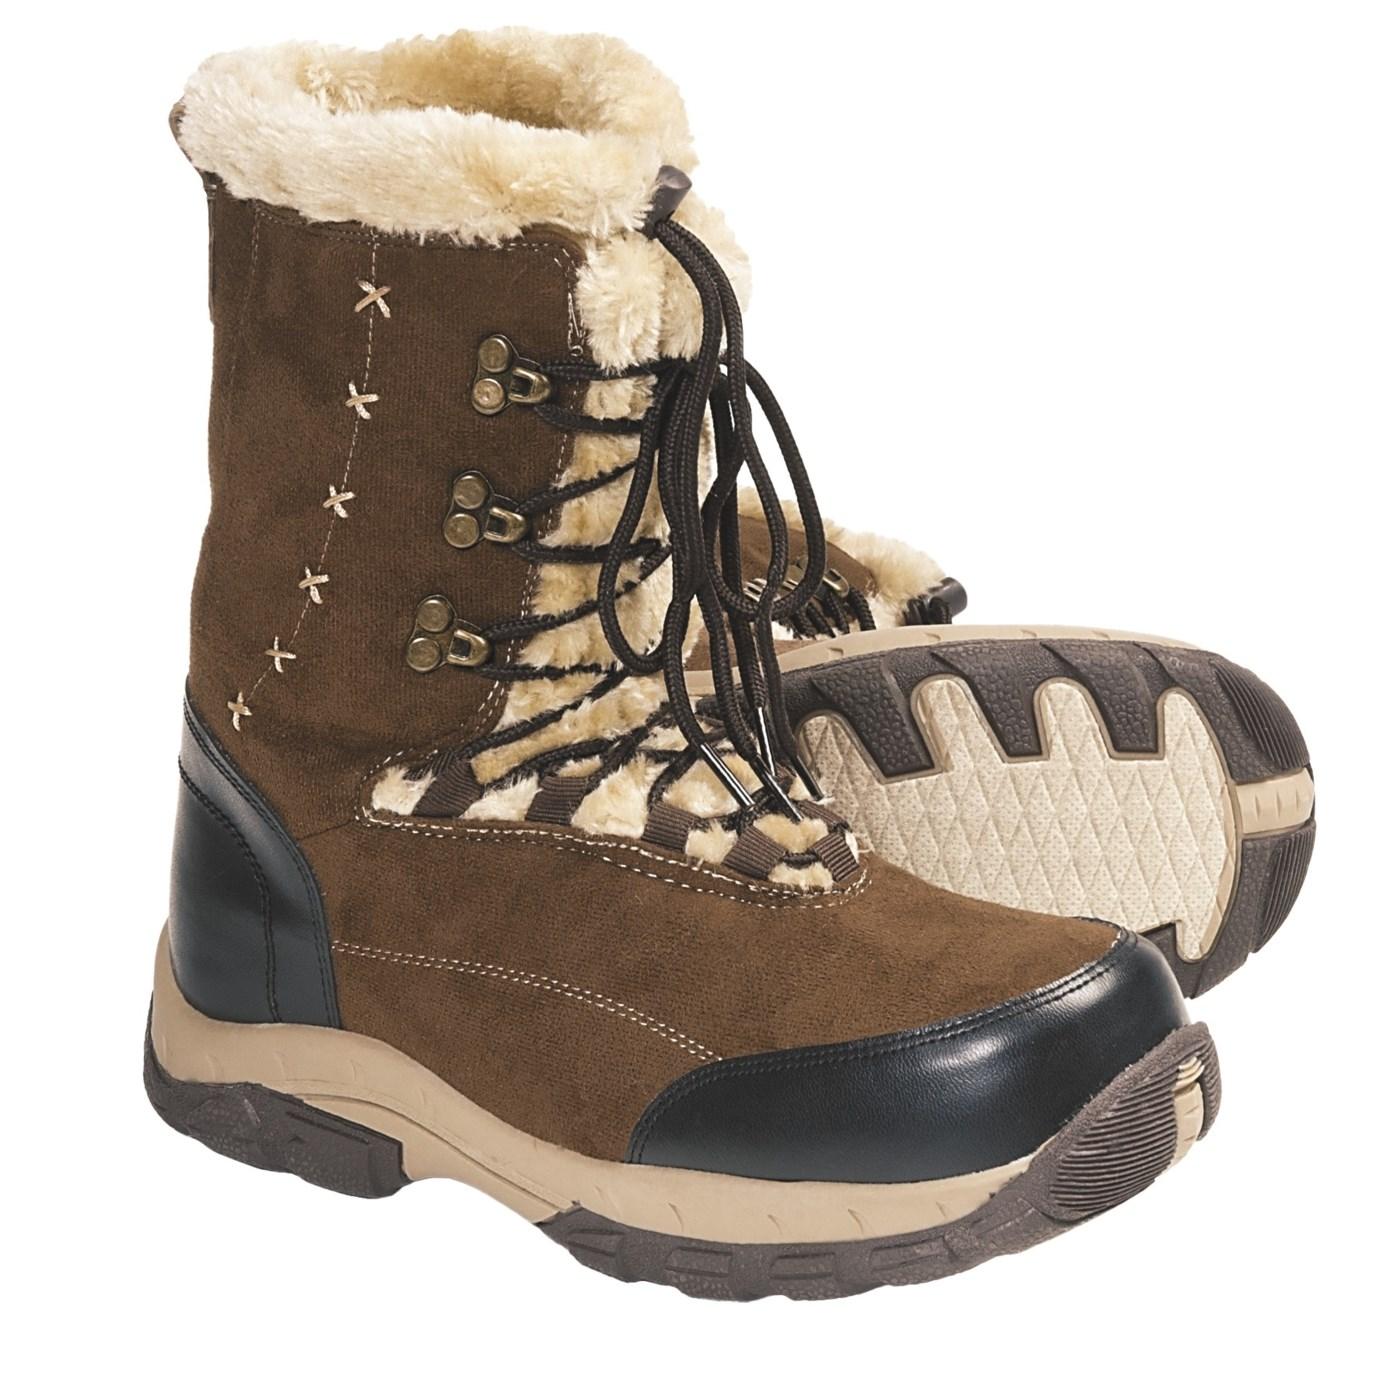 87bf1fd4069b Itasca Anastasia Snow Boots (For Women) 83 on PopScreen